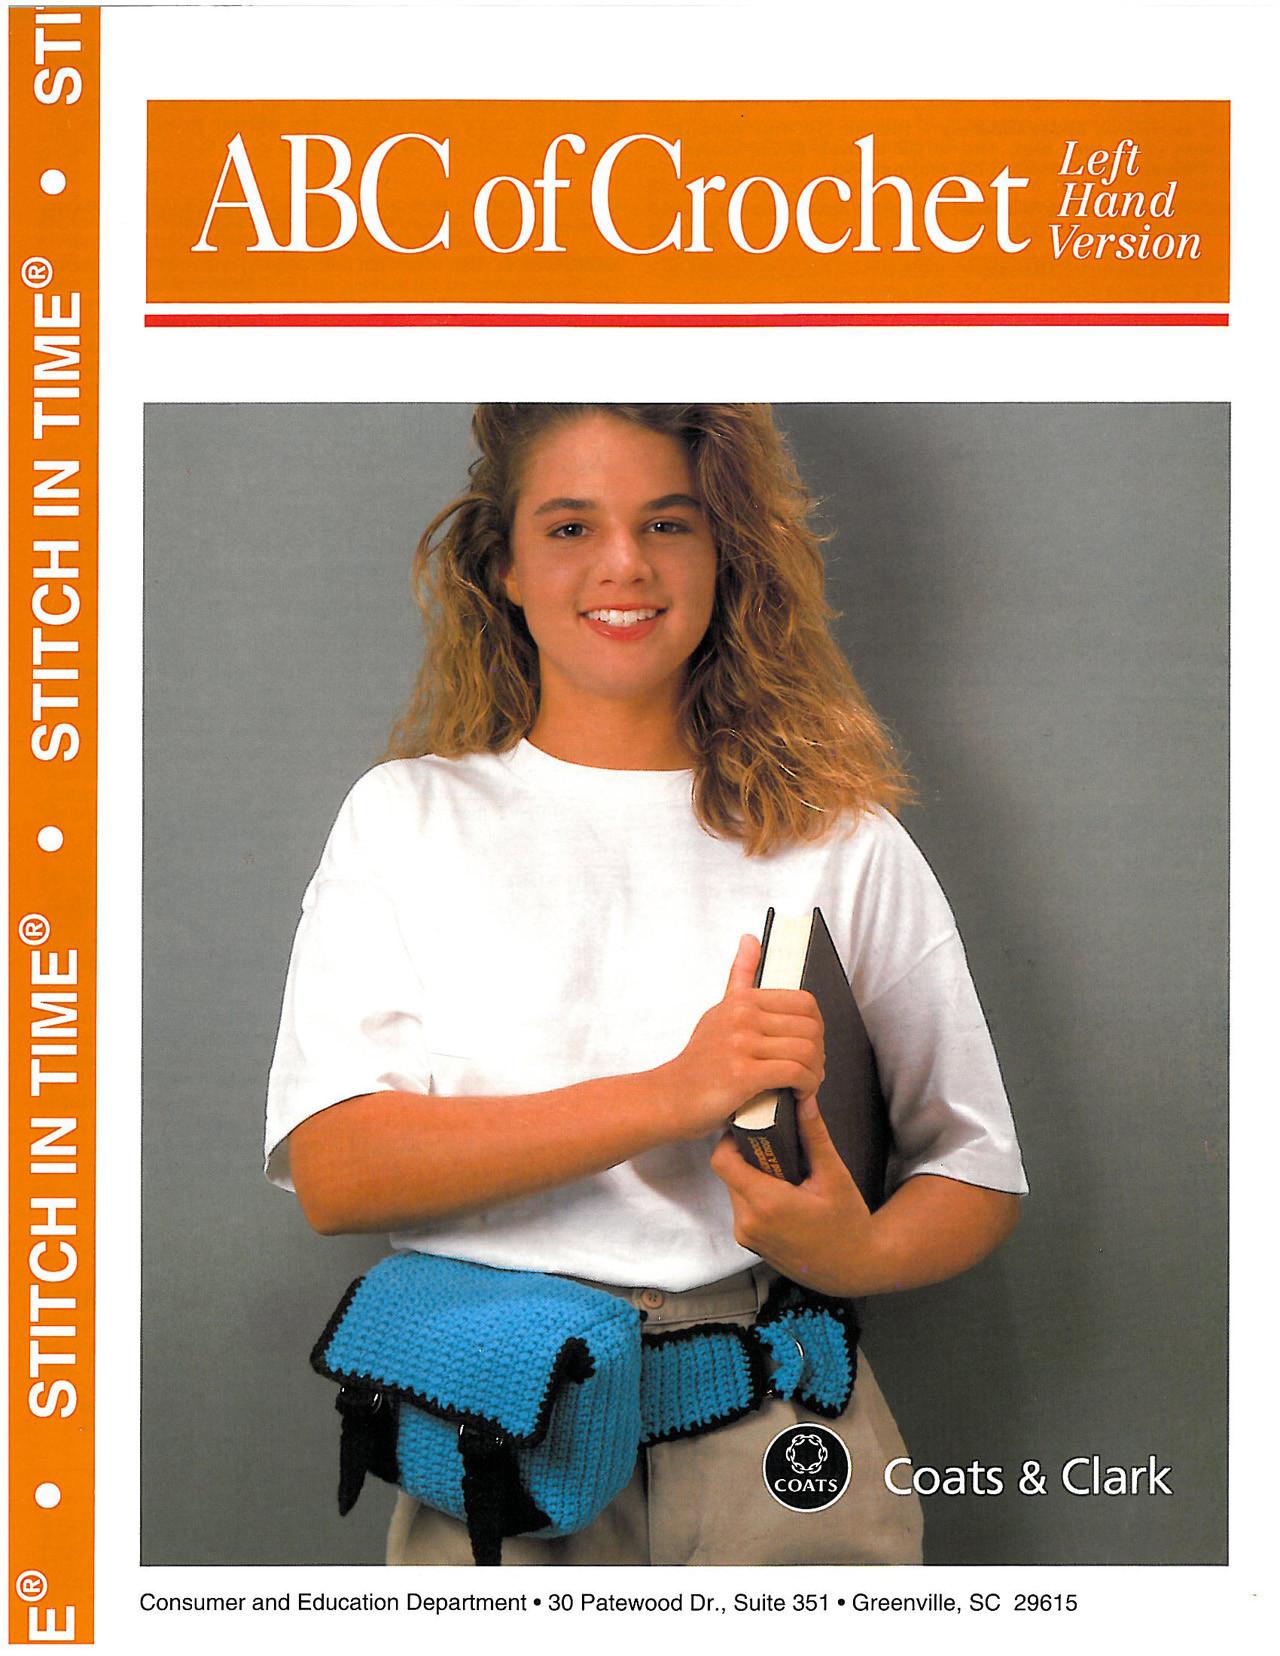 ABC of Crochet – Left Hand Version